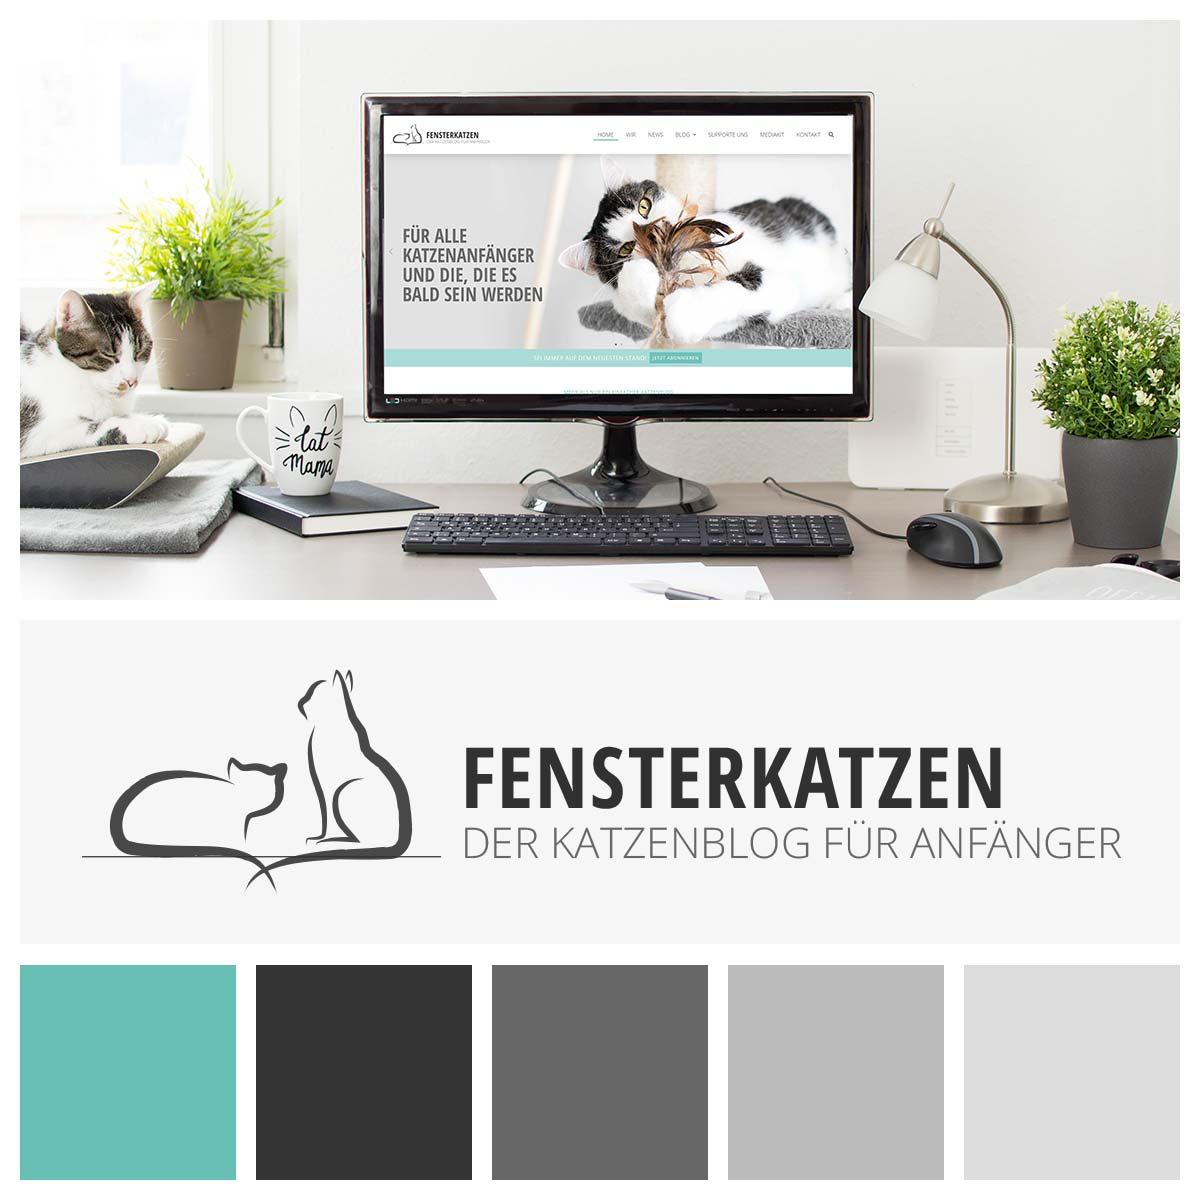 Maria-Grahmann-Portfolio-Projekt-Fensterkatzen